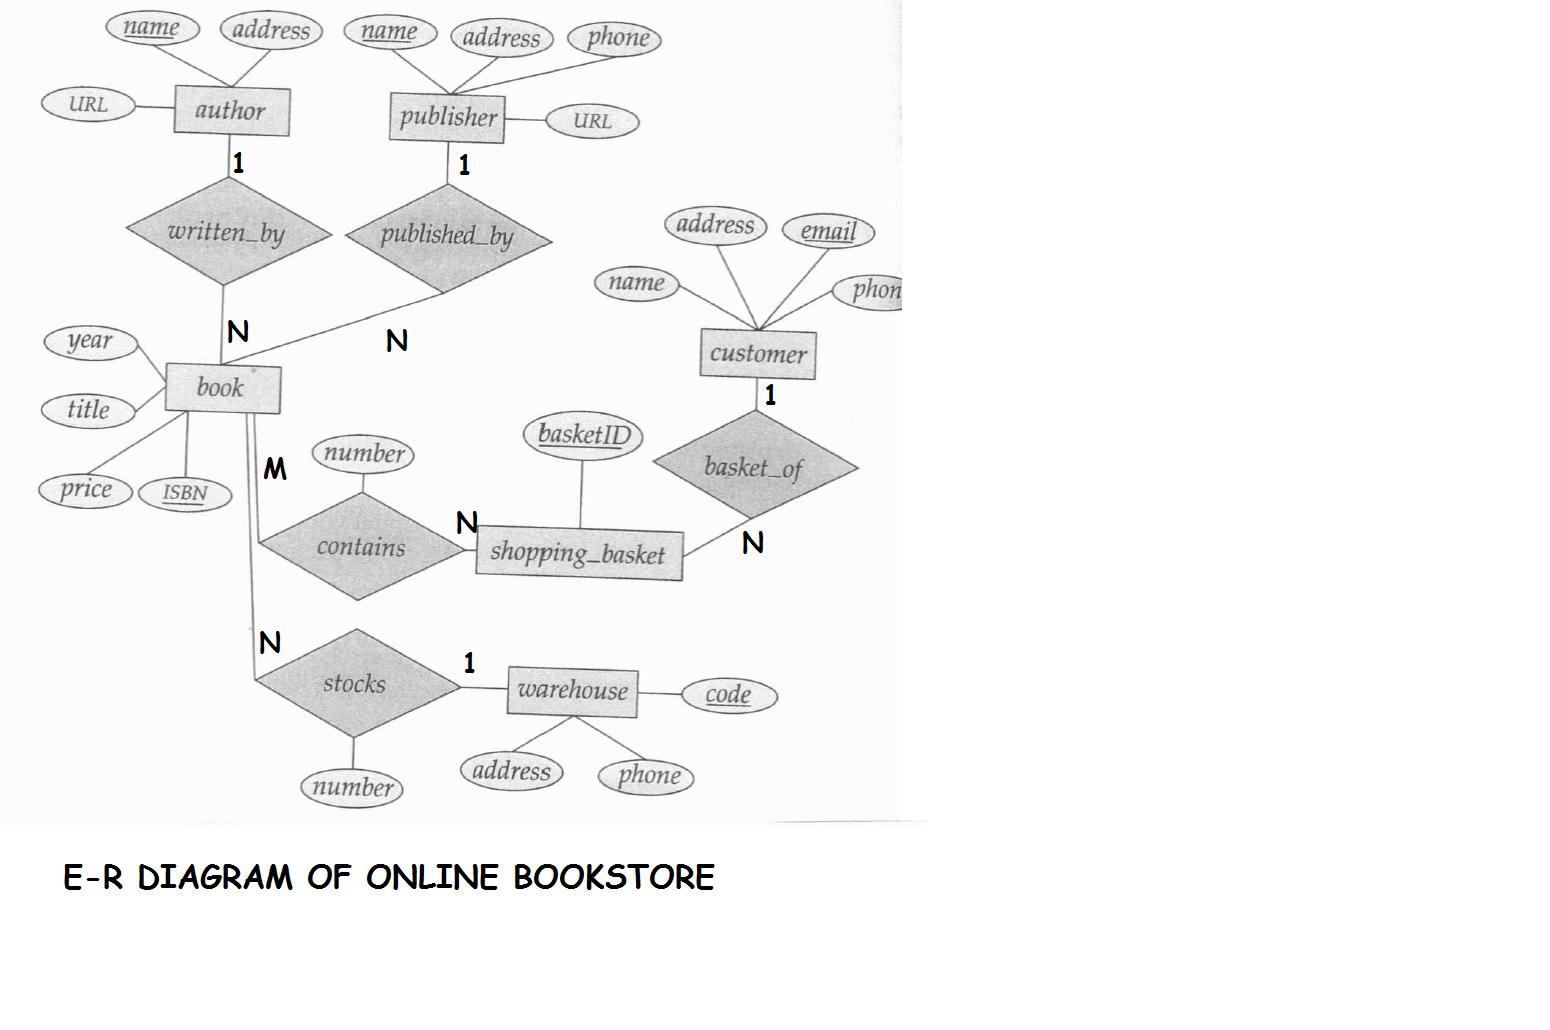 E-R Diagram For Online Bookstore(Roll N0-3,s5 Cs2) | Lbs in Design Er Diagram Online